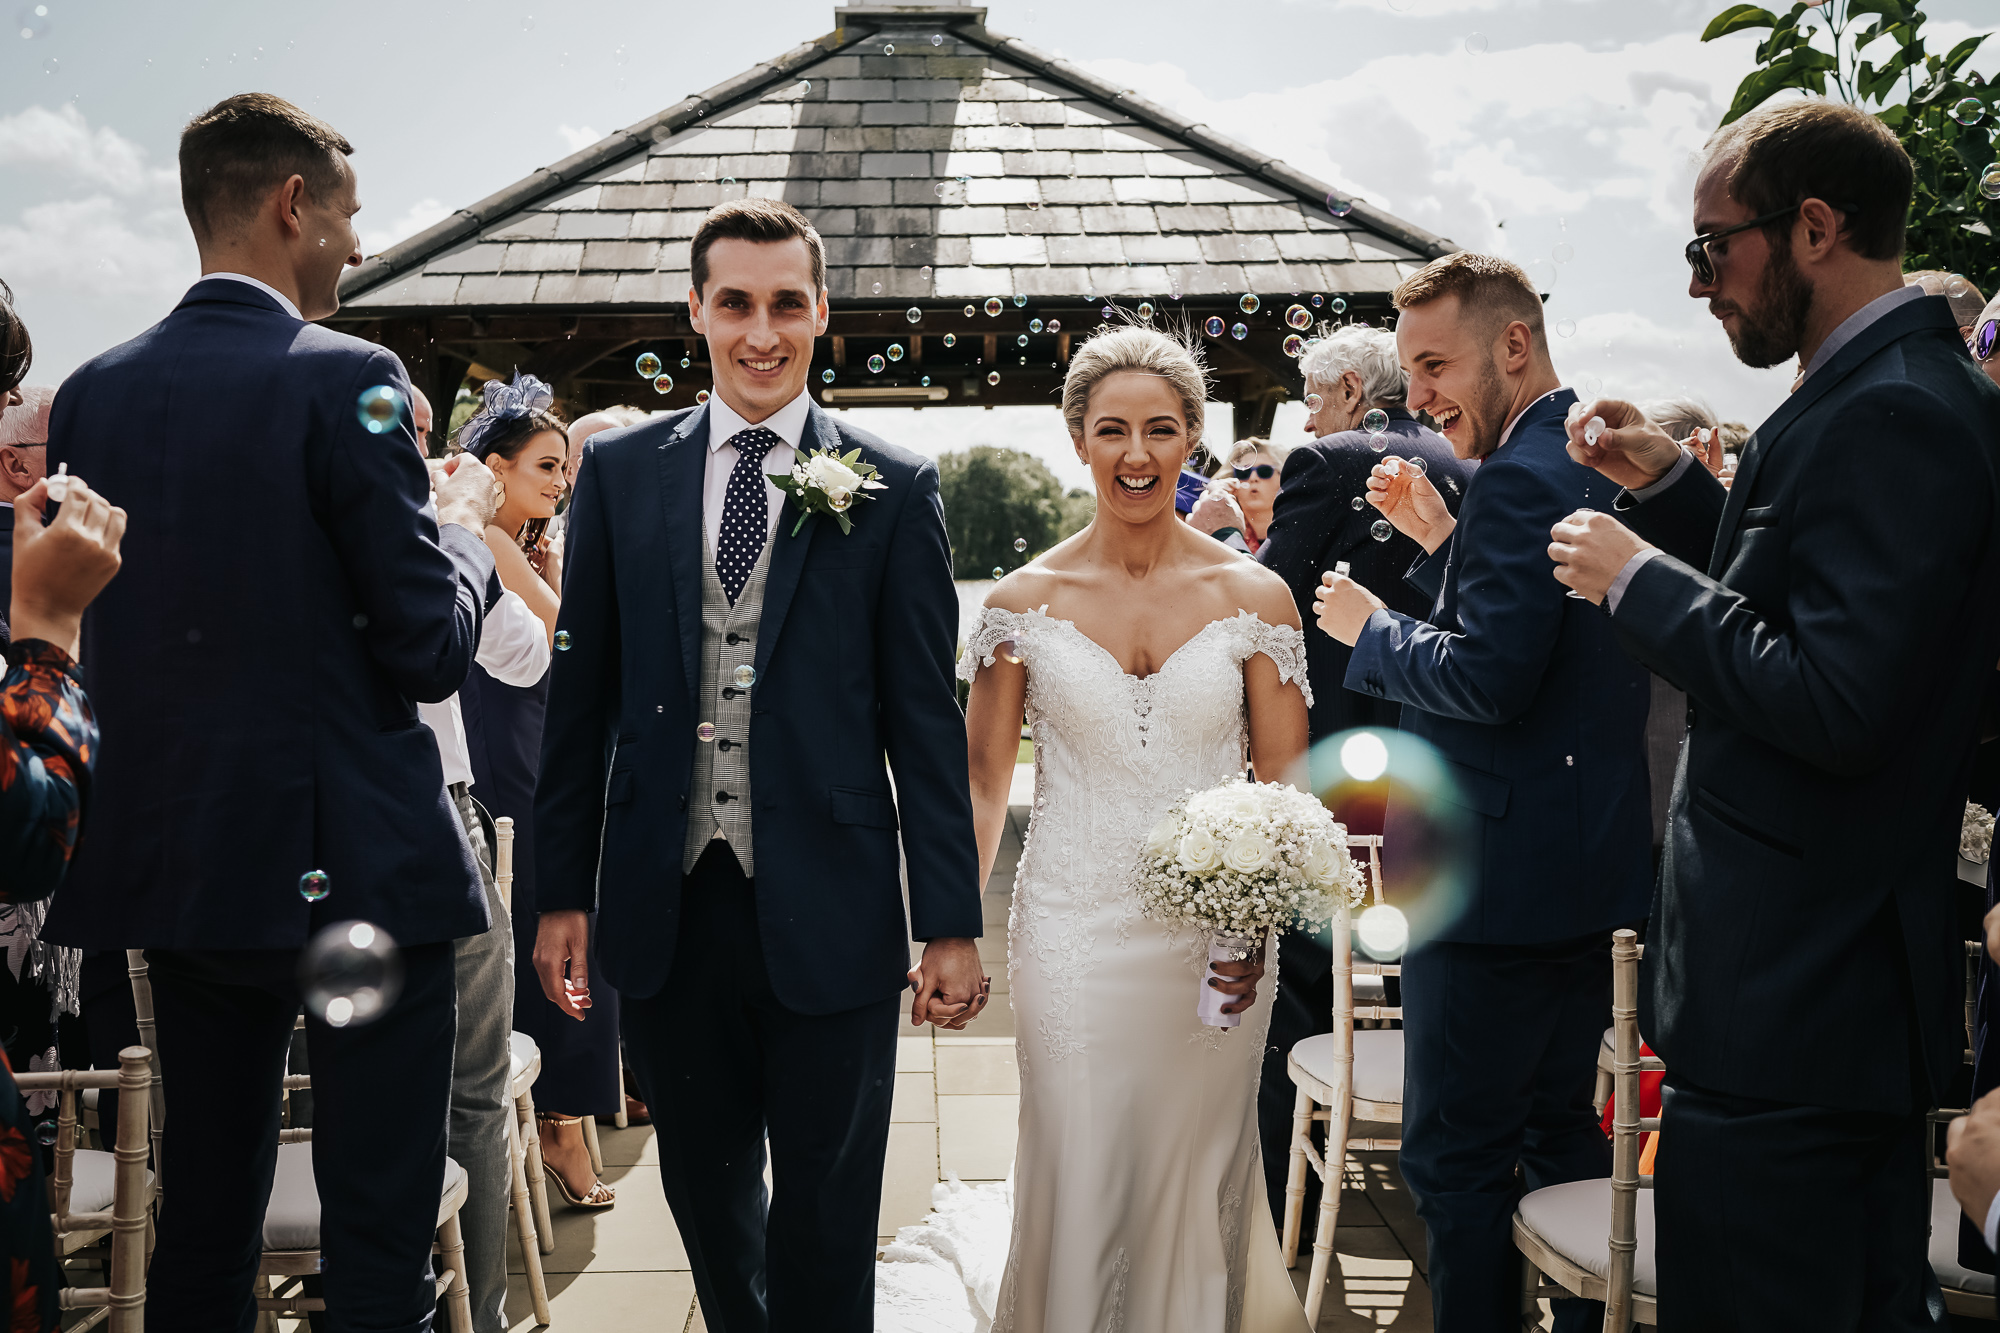 Sandhole Oak Barn Wedding Photography cheshire wedding photographer (22 of 56).jpg